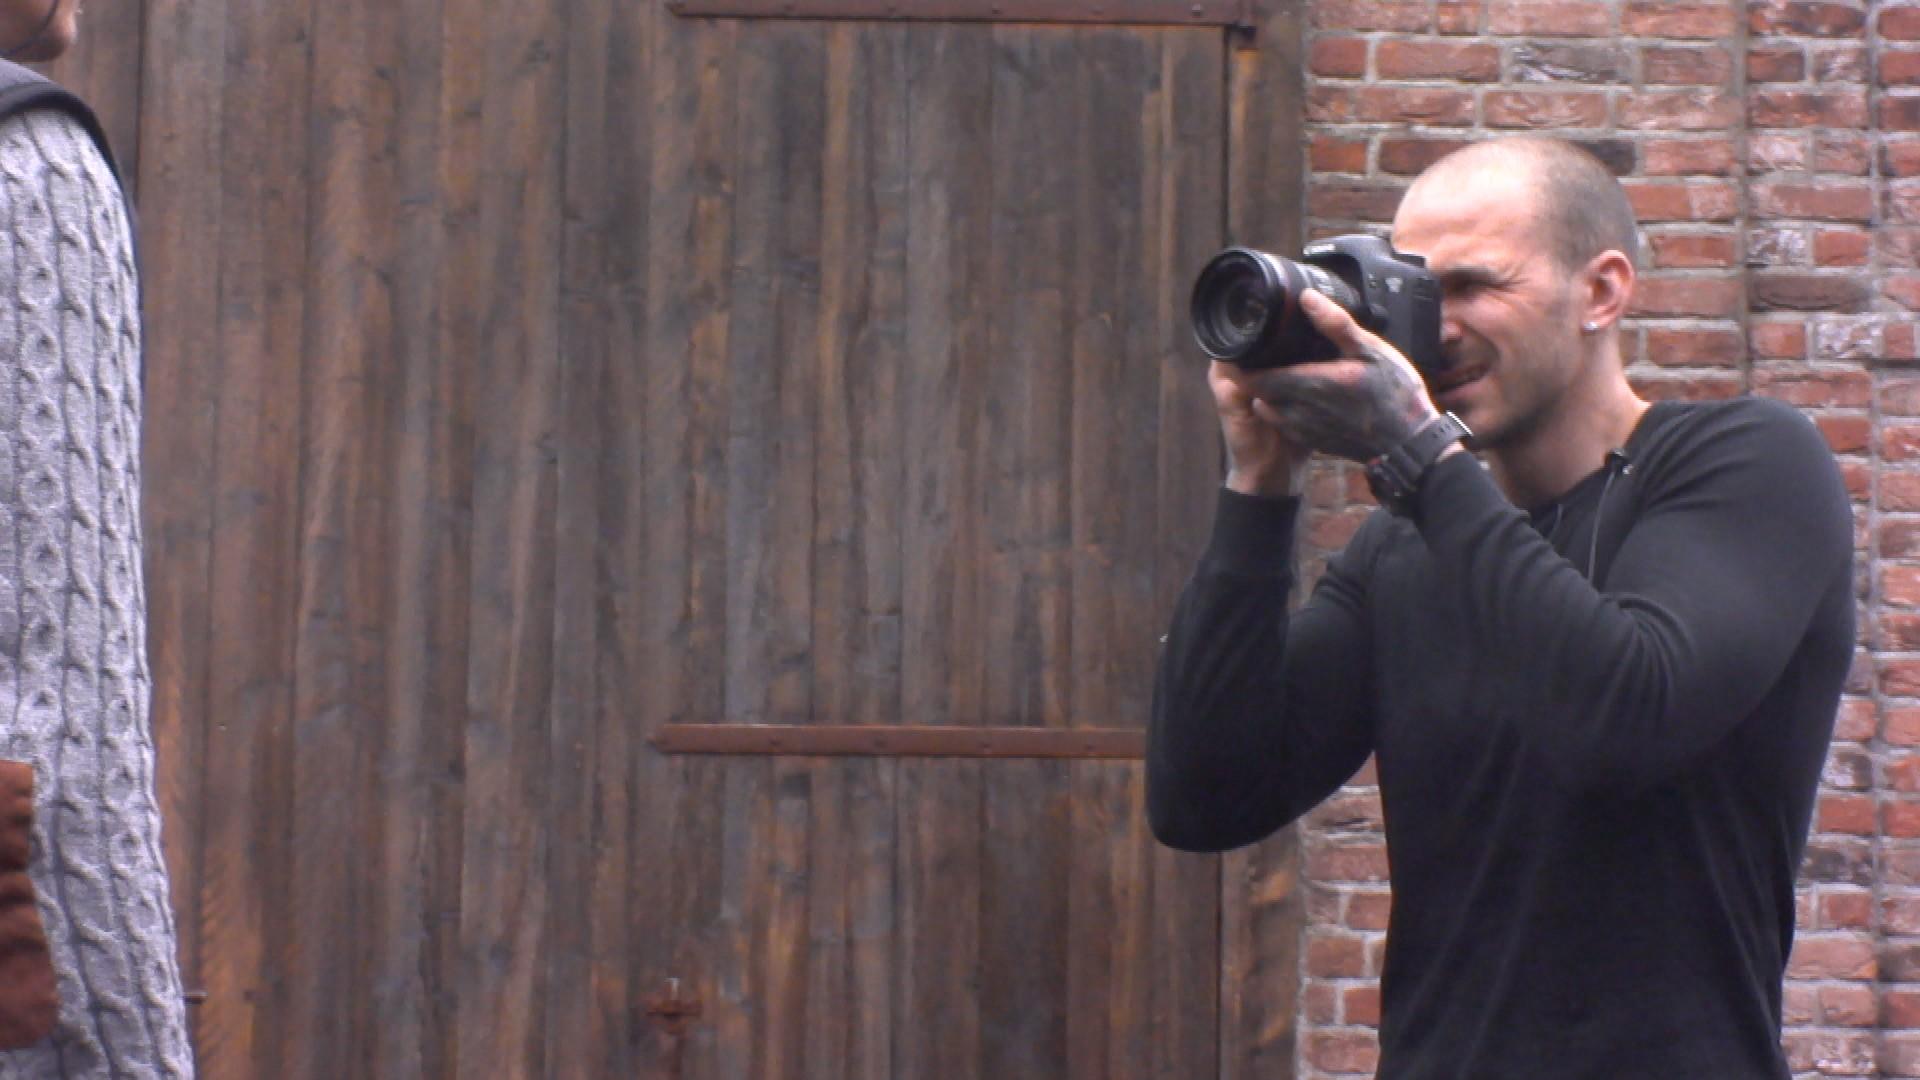 Newtopia Fotoshooting Hans Folge 29 02.04.2015